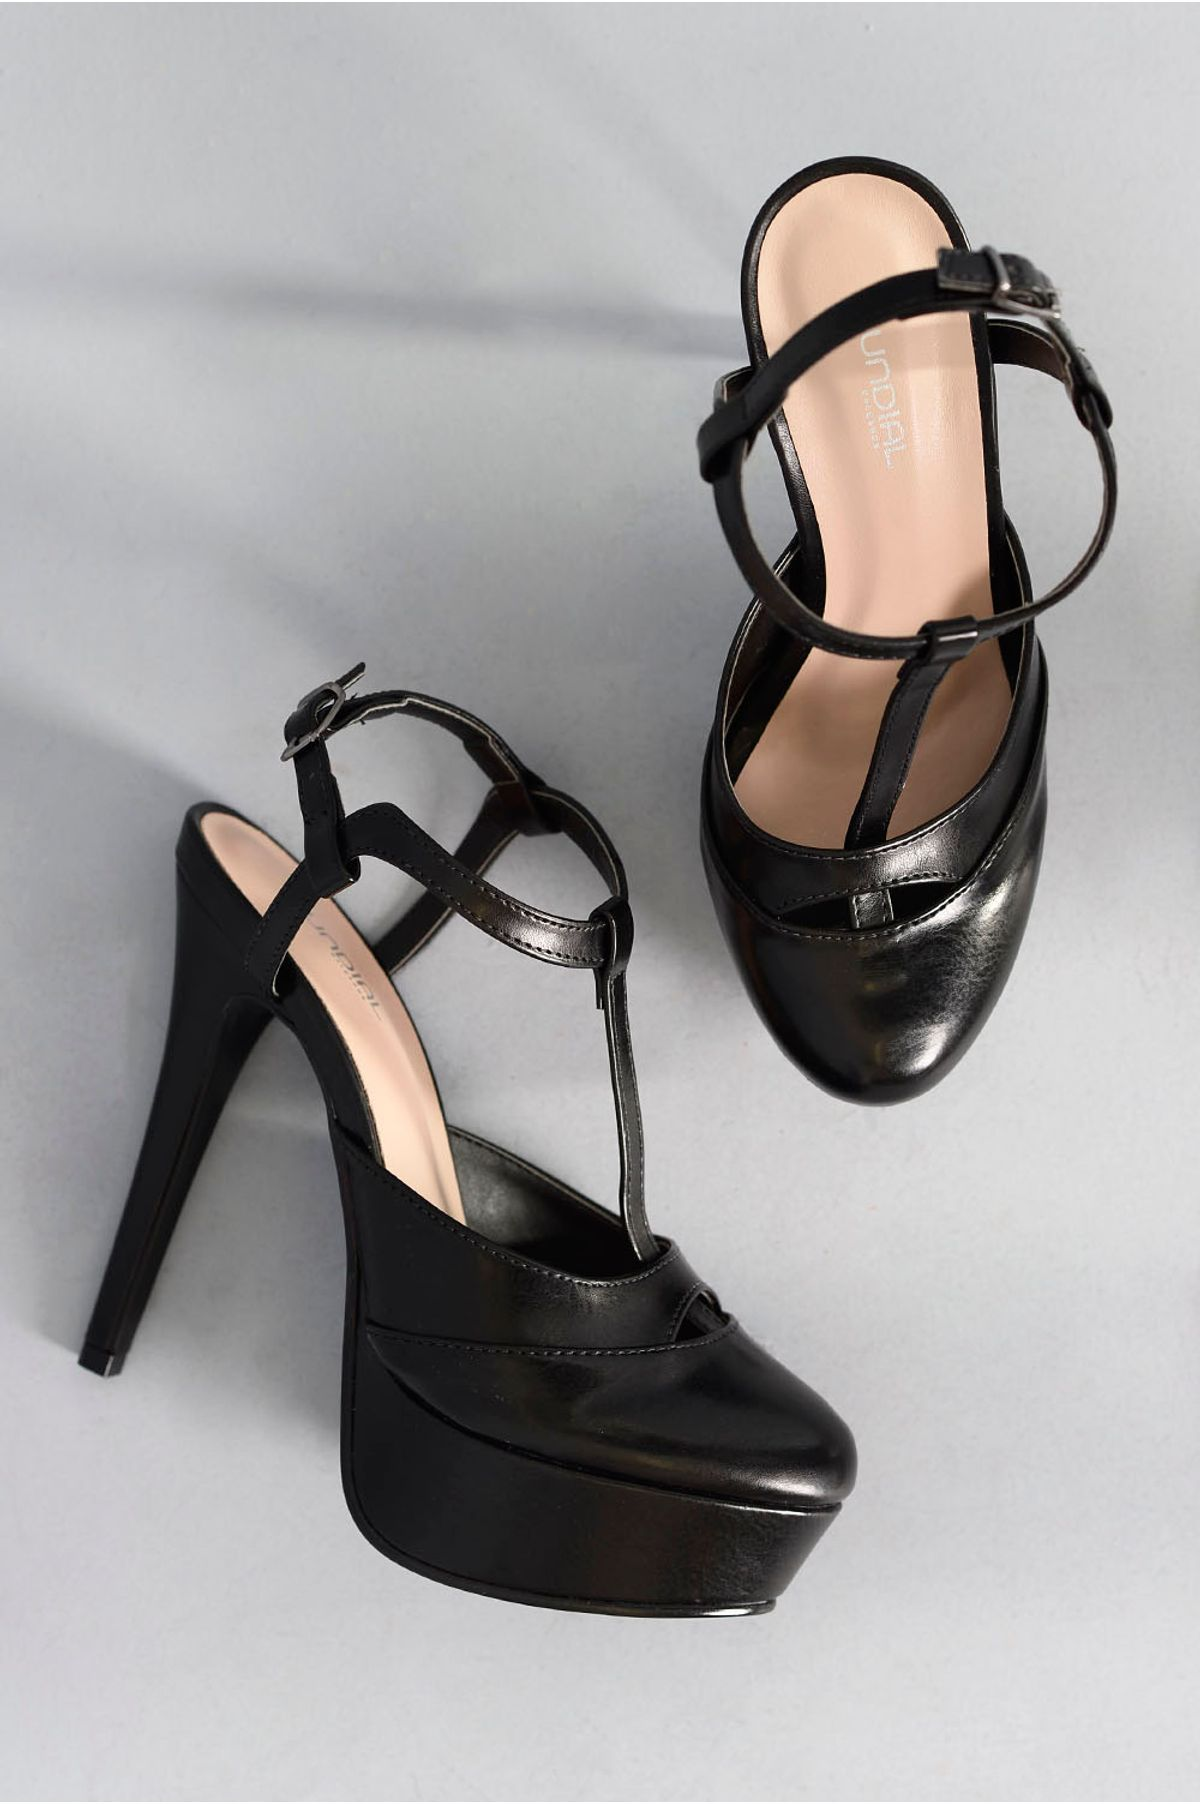 1aea1d0ab8 Sapato Feminino Salto Alto Karly Mundial PRETO - Mundial Calçados